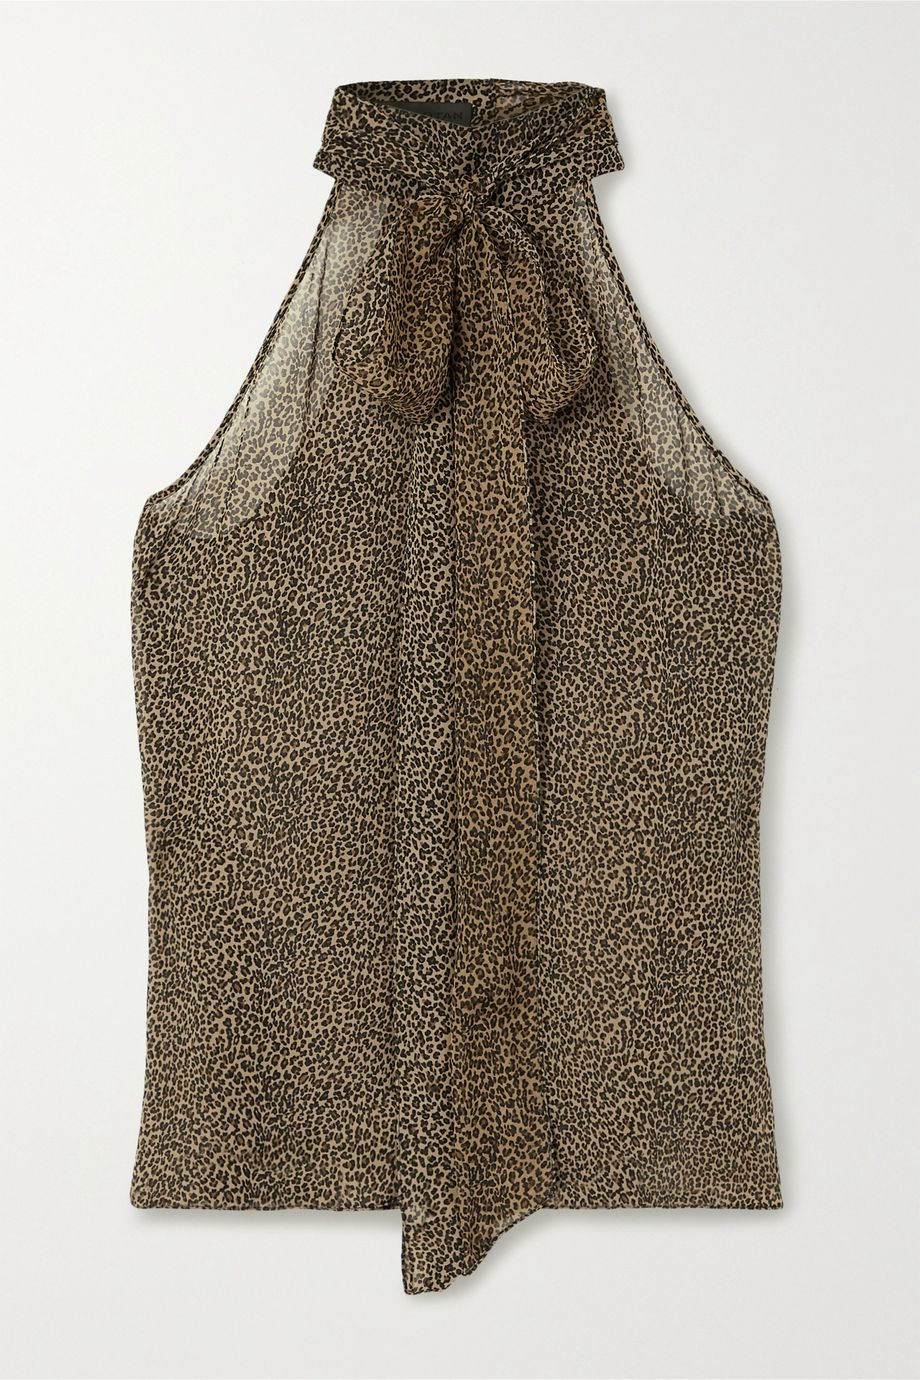 Nili Lotan Ceyda pussy-bow leopard-print silk crepe de chine halterneck top